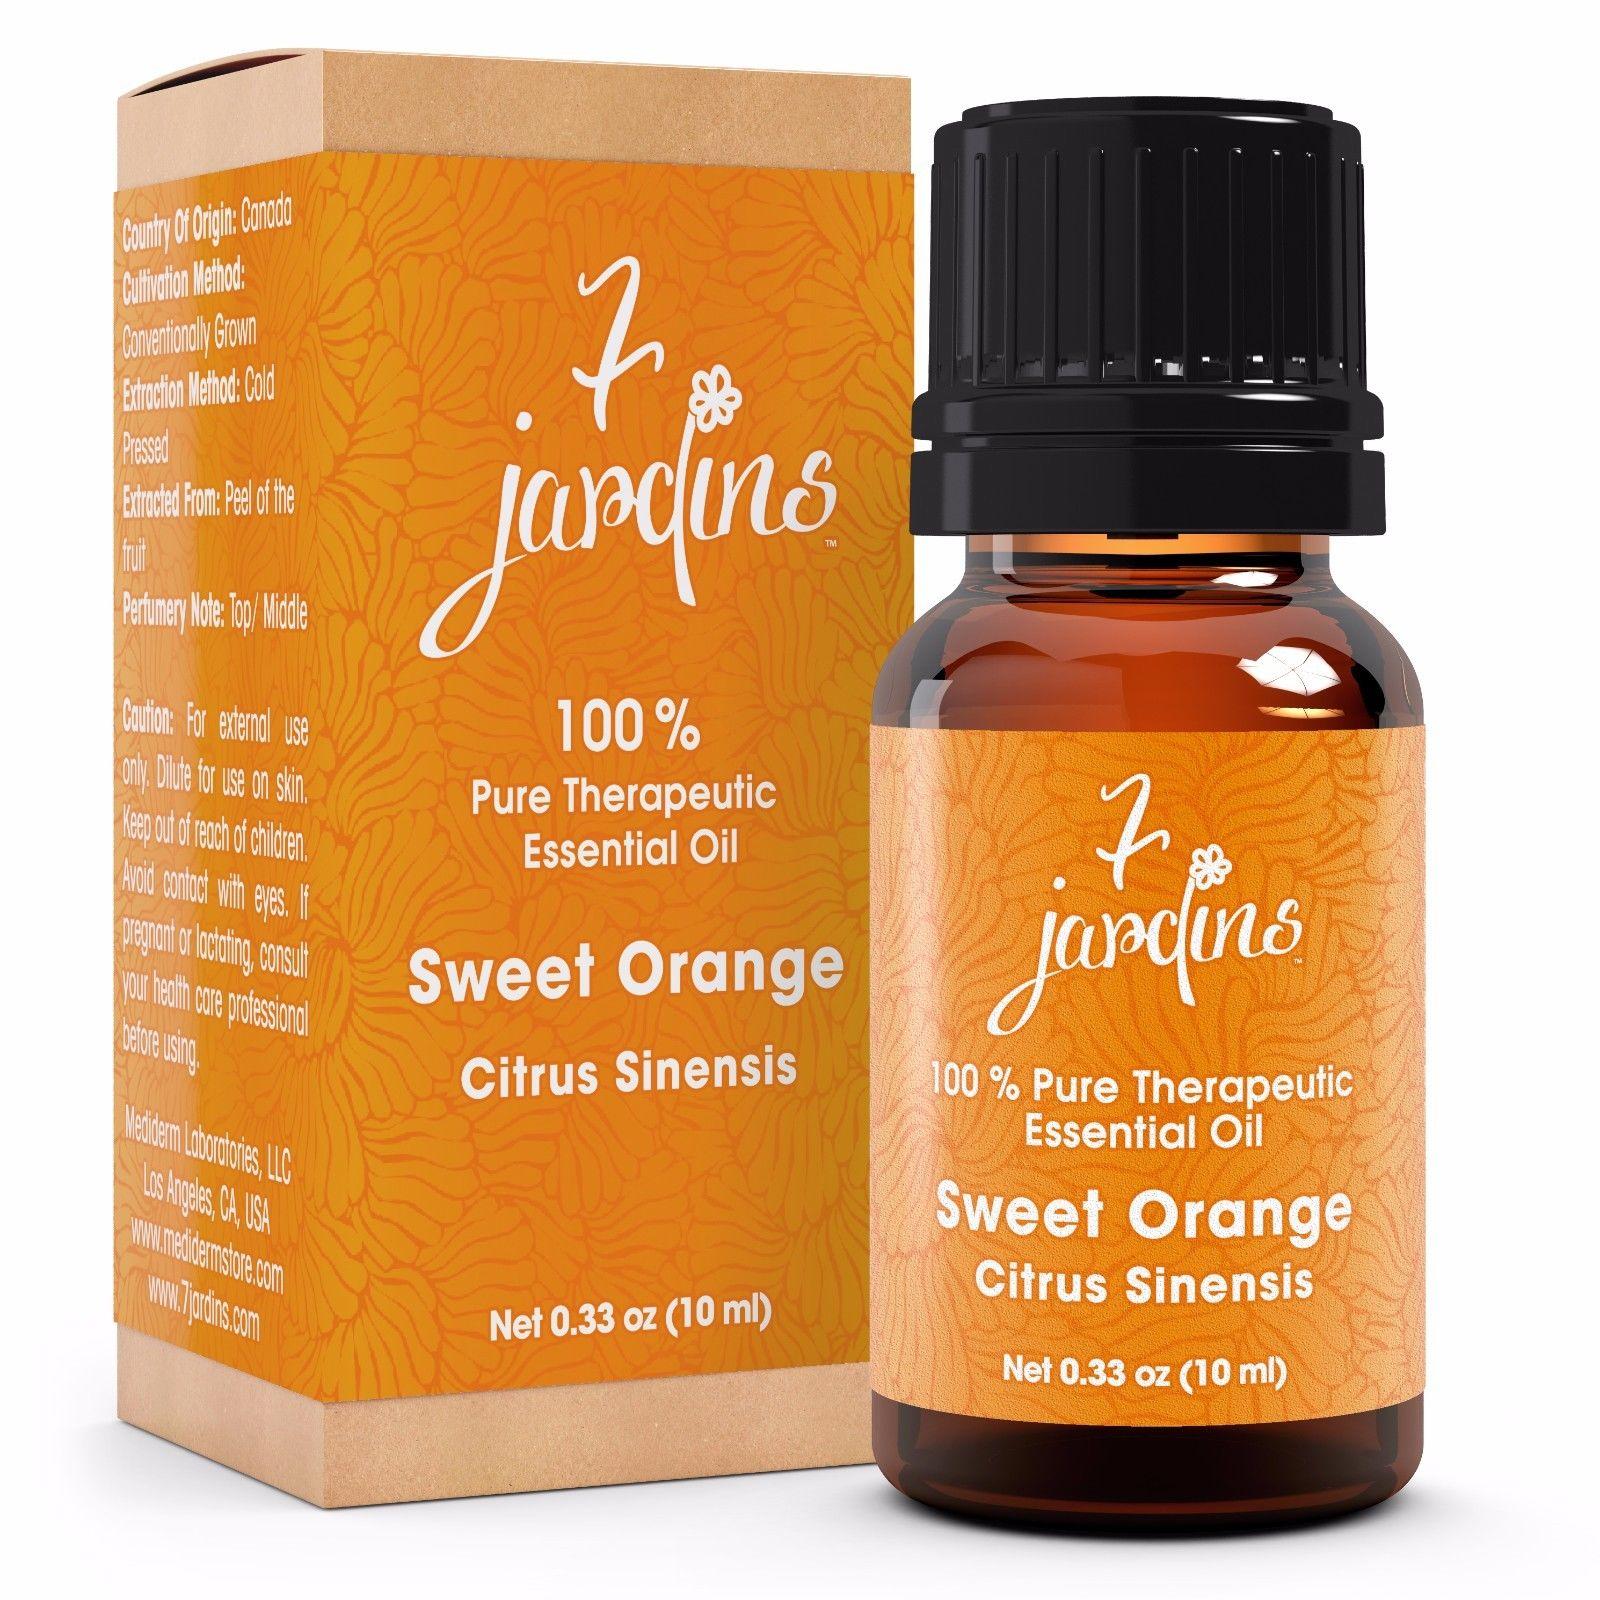 Premium Sweet Orange 100% Natural Therapeutic Essential Oil by 7 Jardins - 10 ml